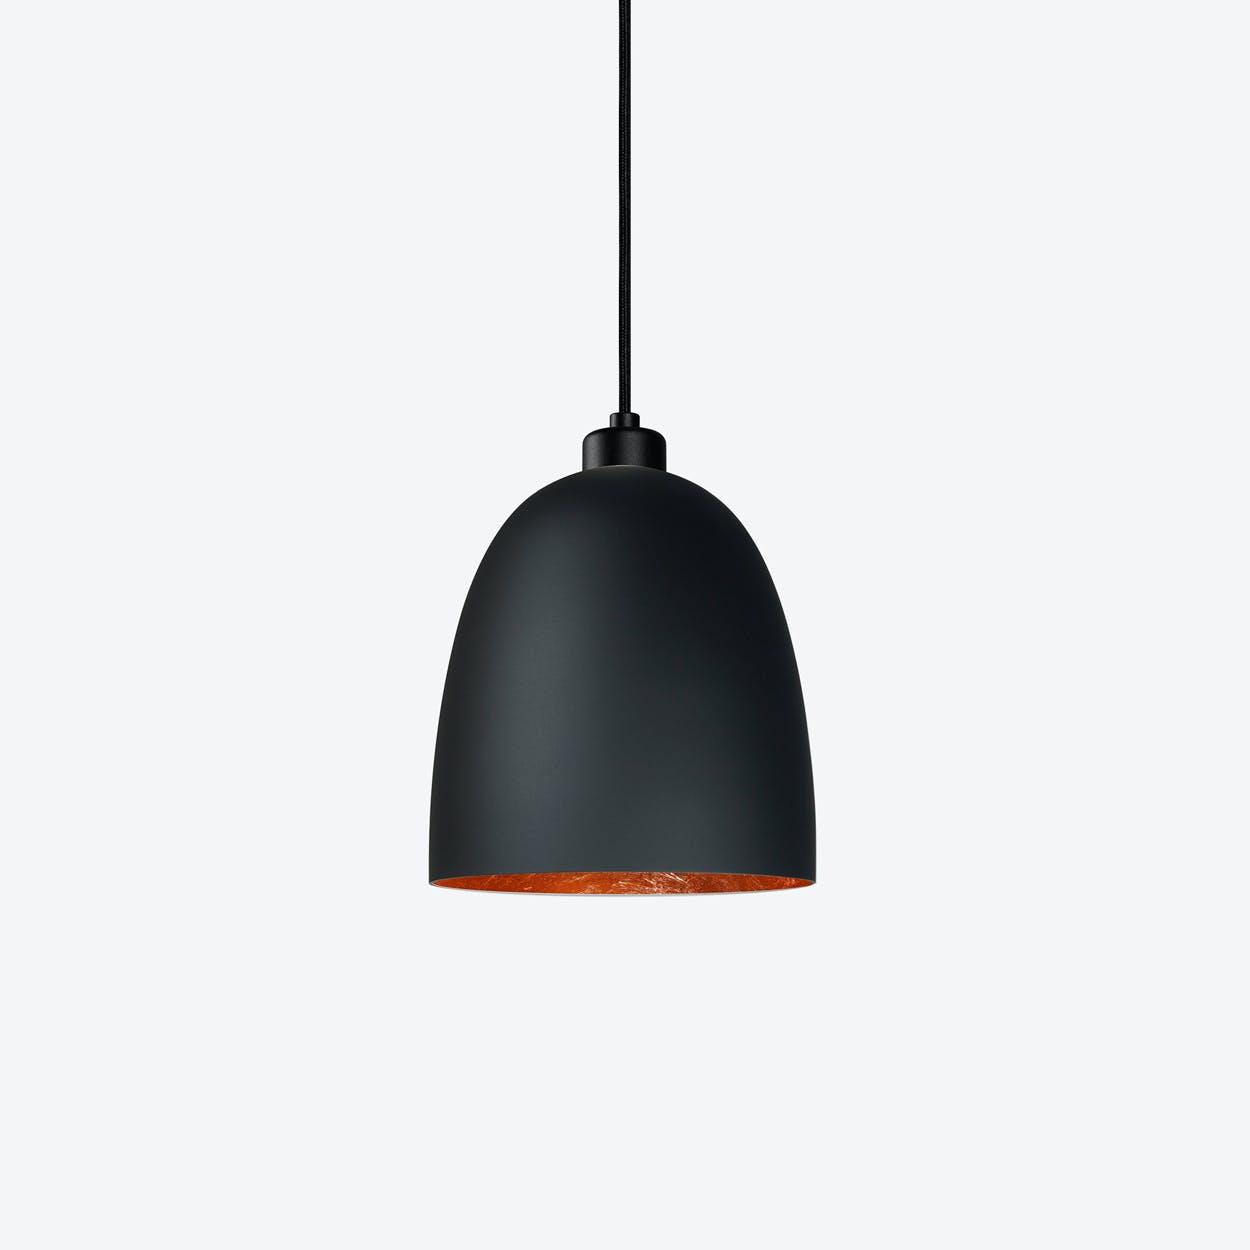 AWA Single Pendant Light in Matte Black with Copper Leaf